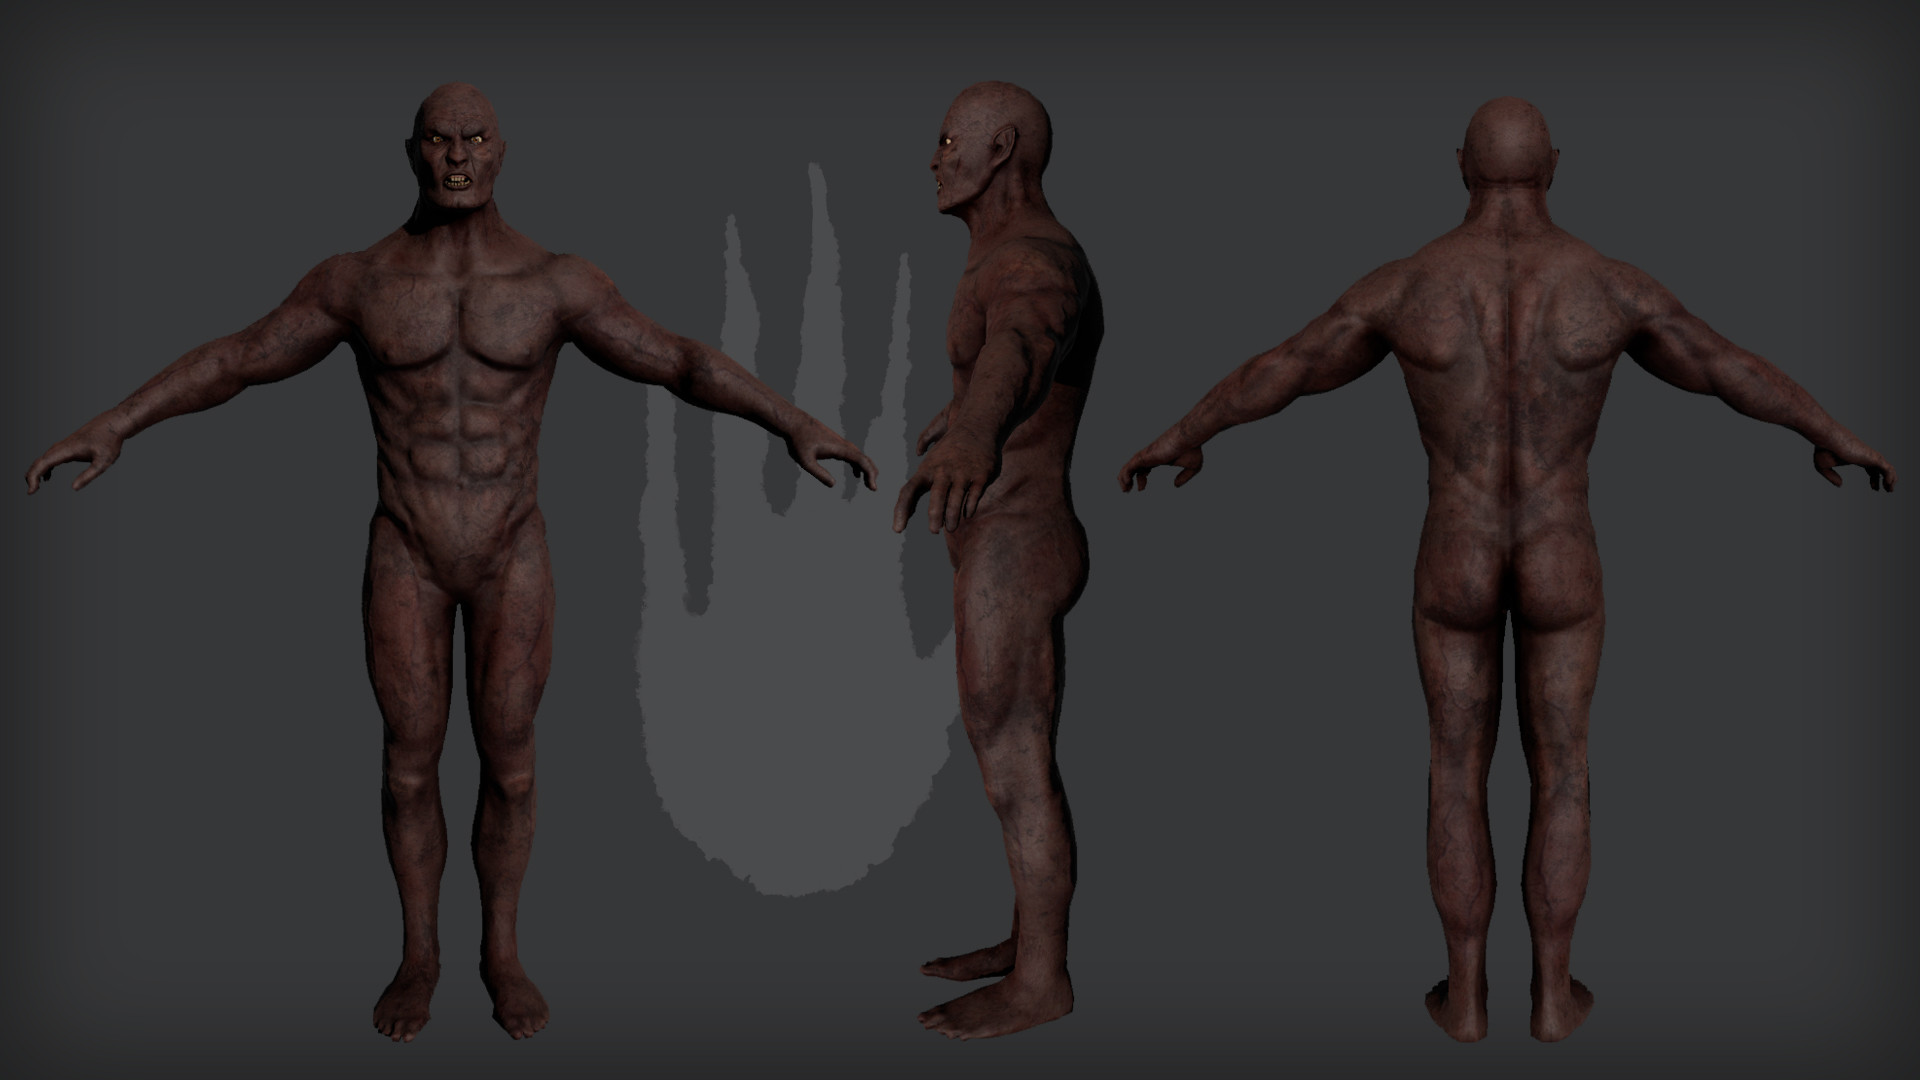 Naked body rendered in 3DO